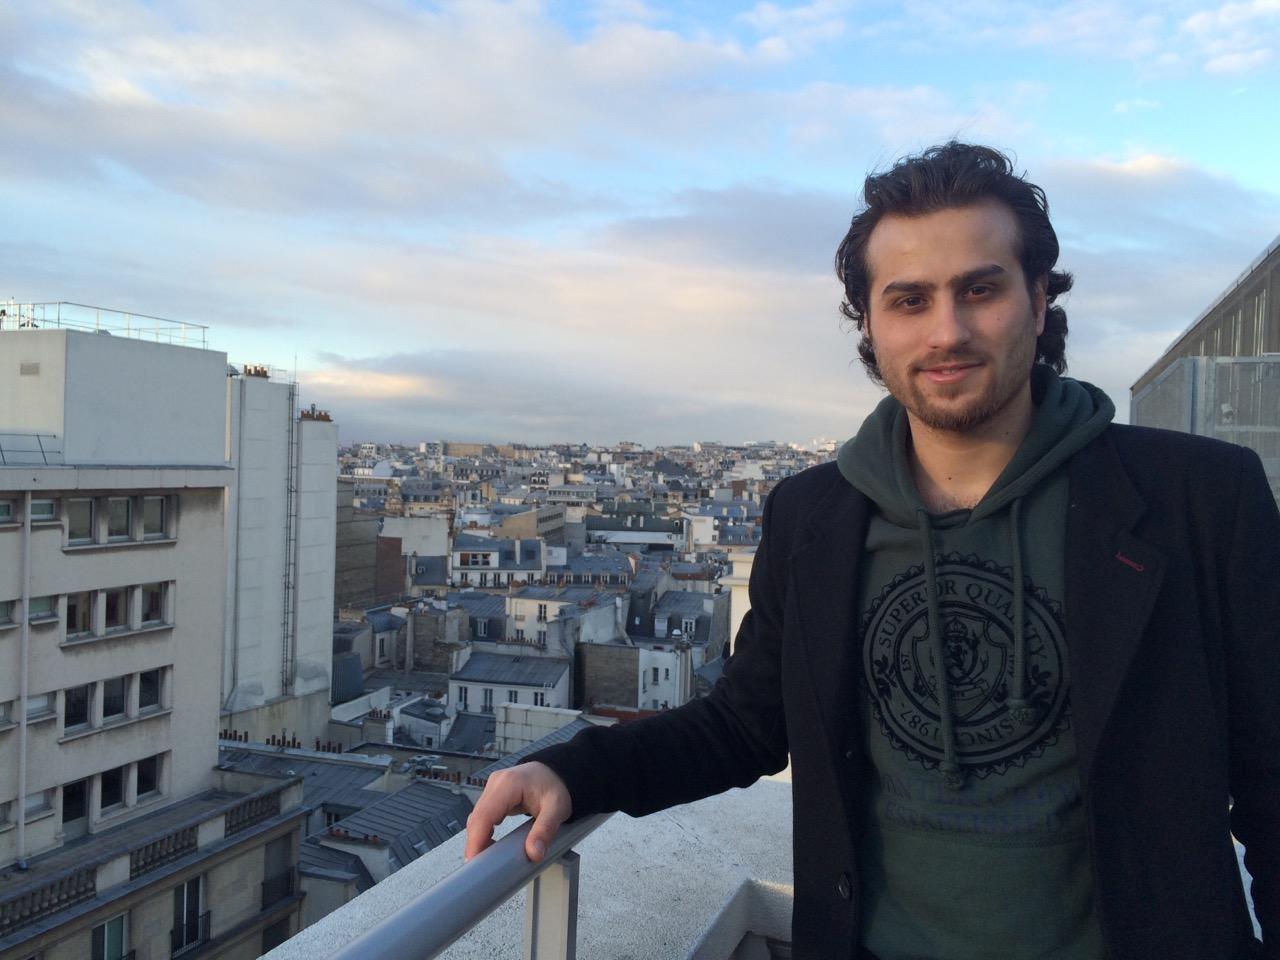 Ali Nehme - Graduate Student - Subject Matter Expert from Kolabtree